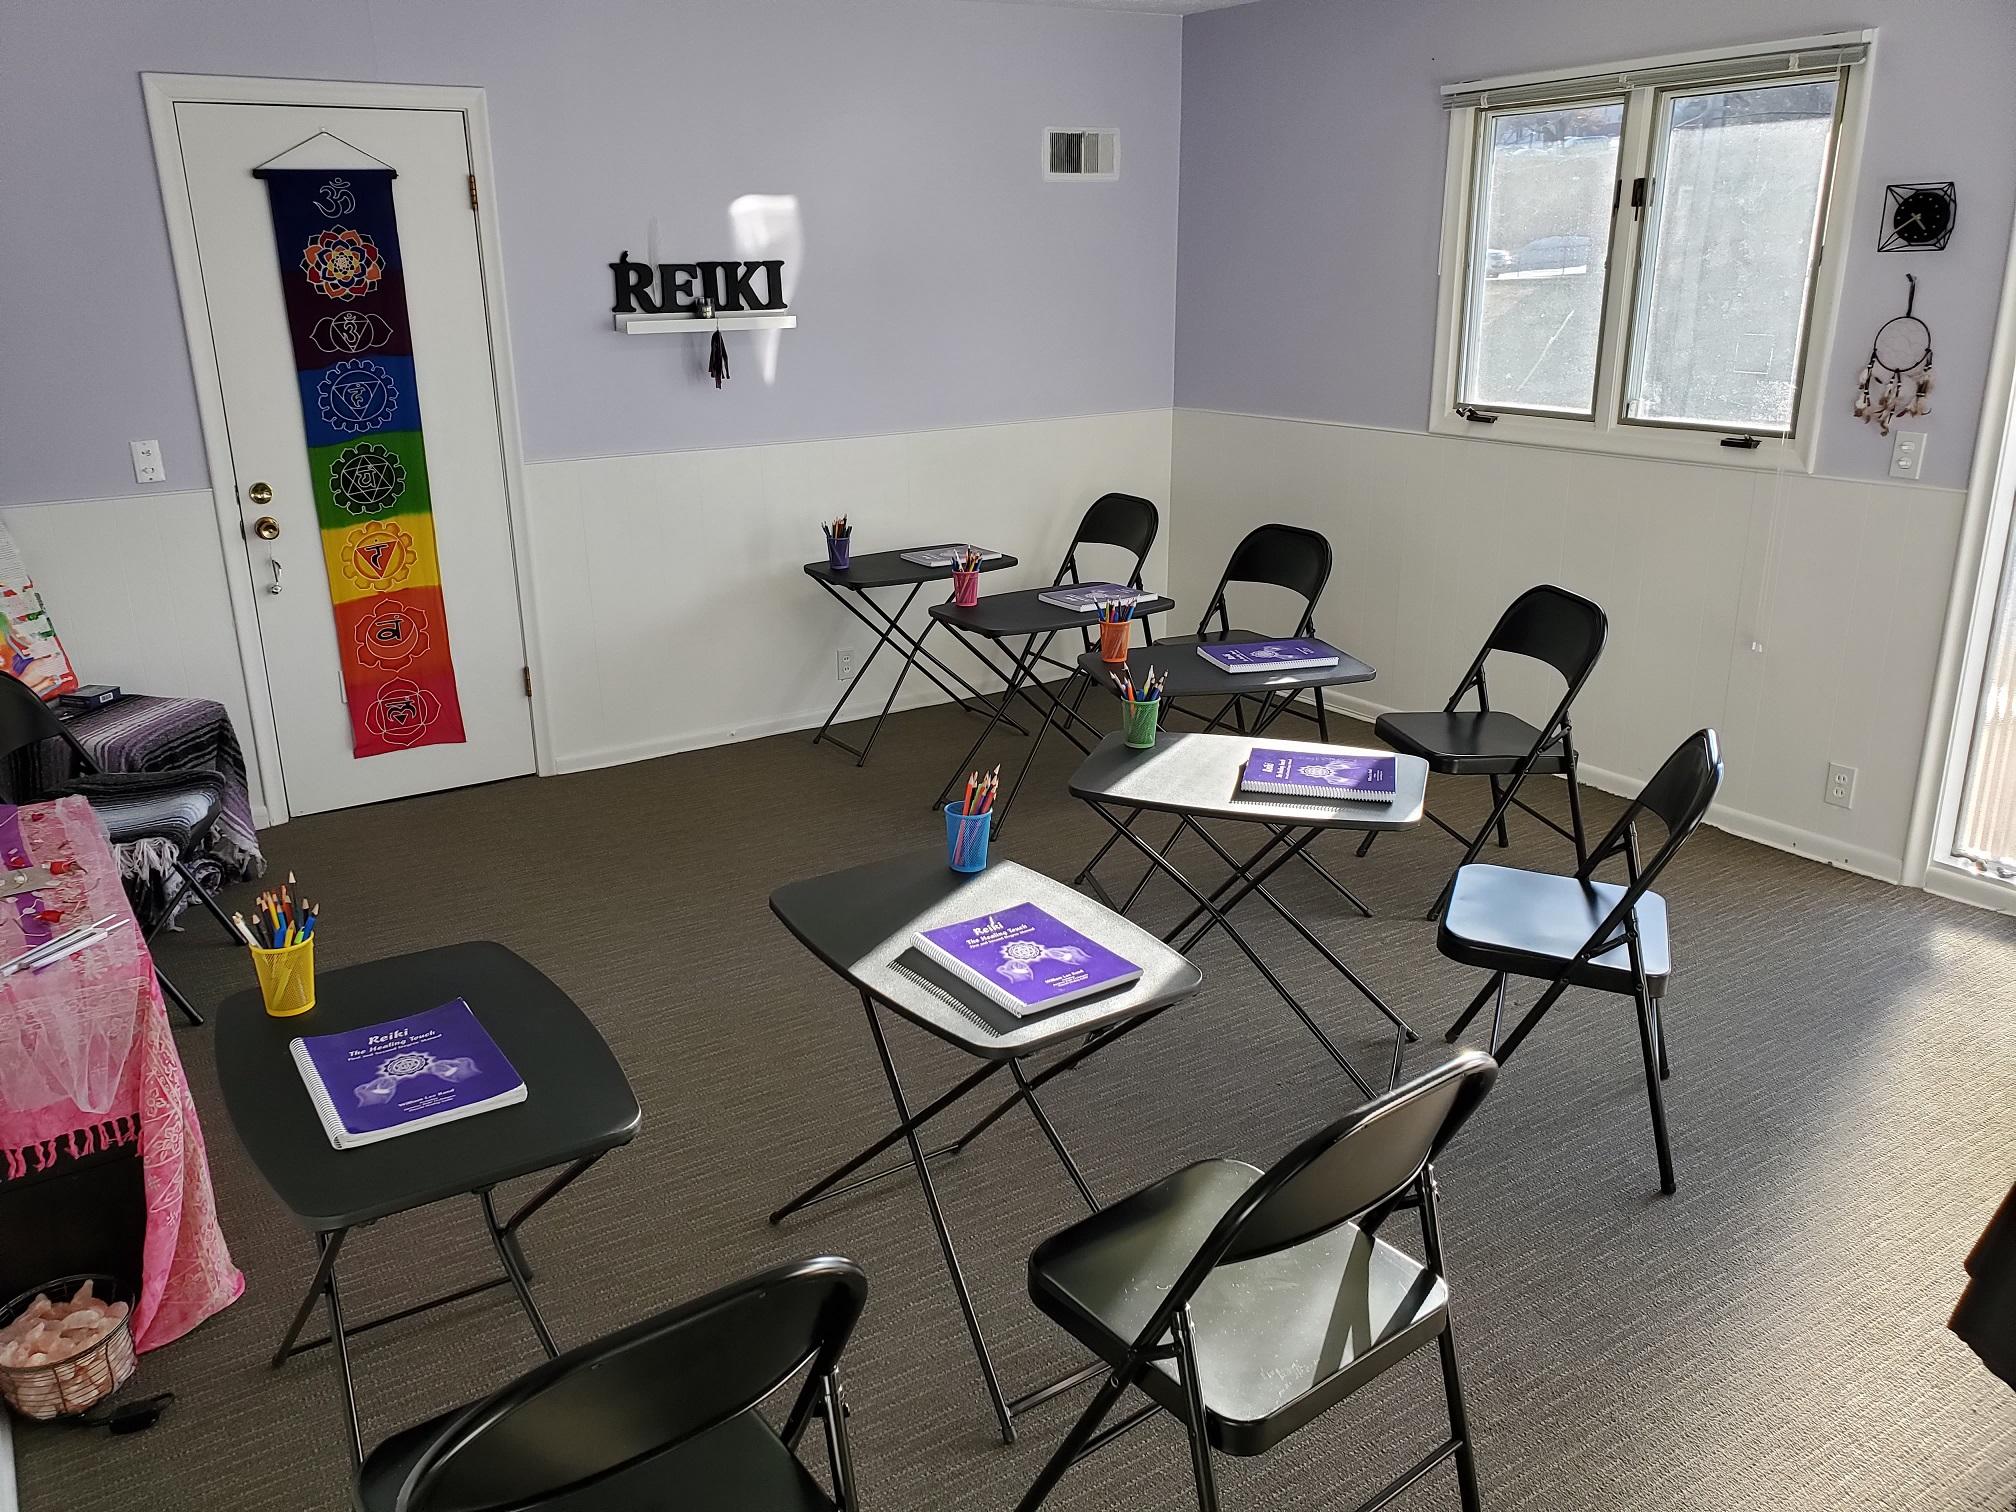 Reiki Classroom 1